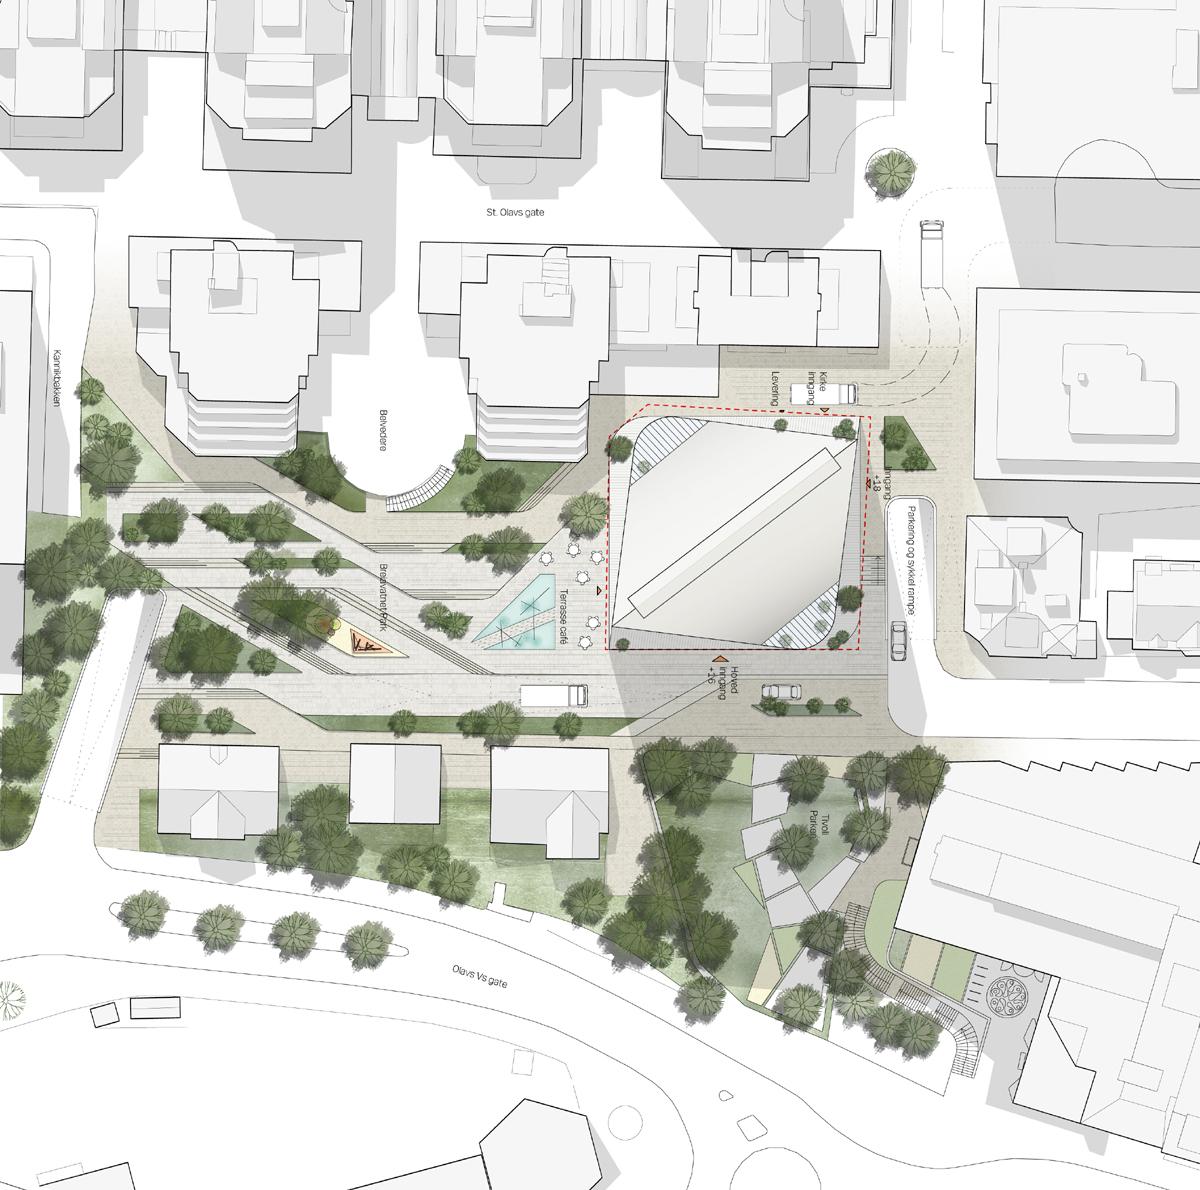 Breiavatnet Lanterna_Stavanger_SHL Architects_RenderSter van de Week